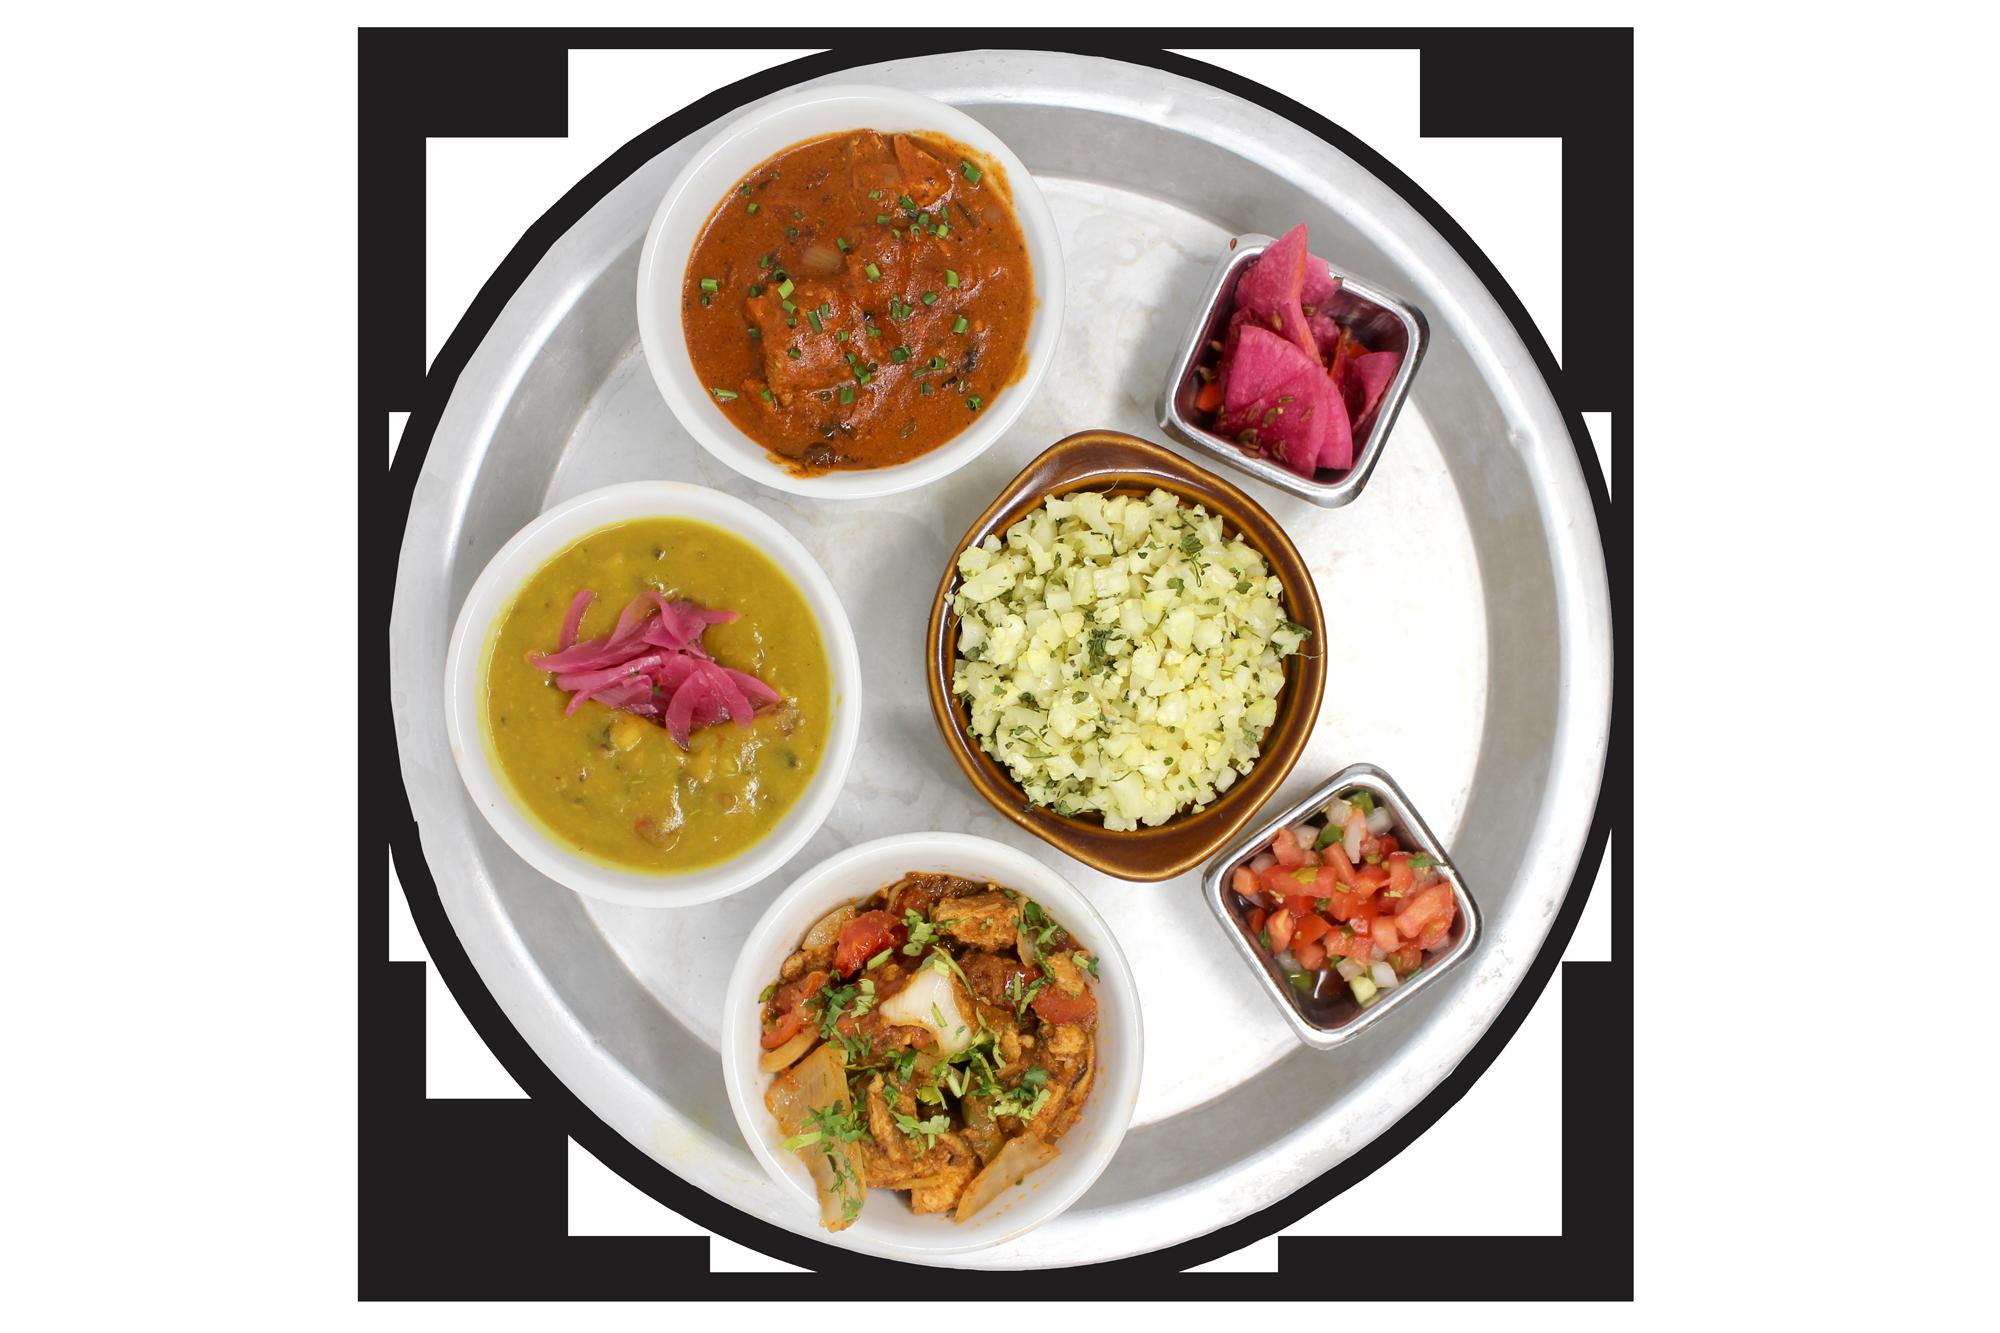 LITE THALI   riced cauliflower, daal lentils, kadhai chicken or free range plant protein (V), chicken or paneer tikka masala (VG), pico & pickles